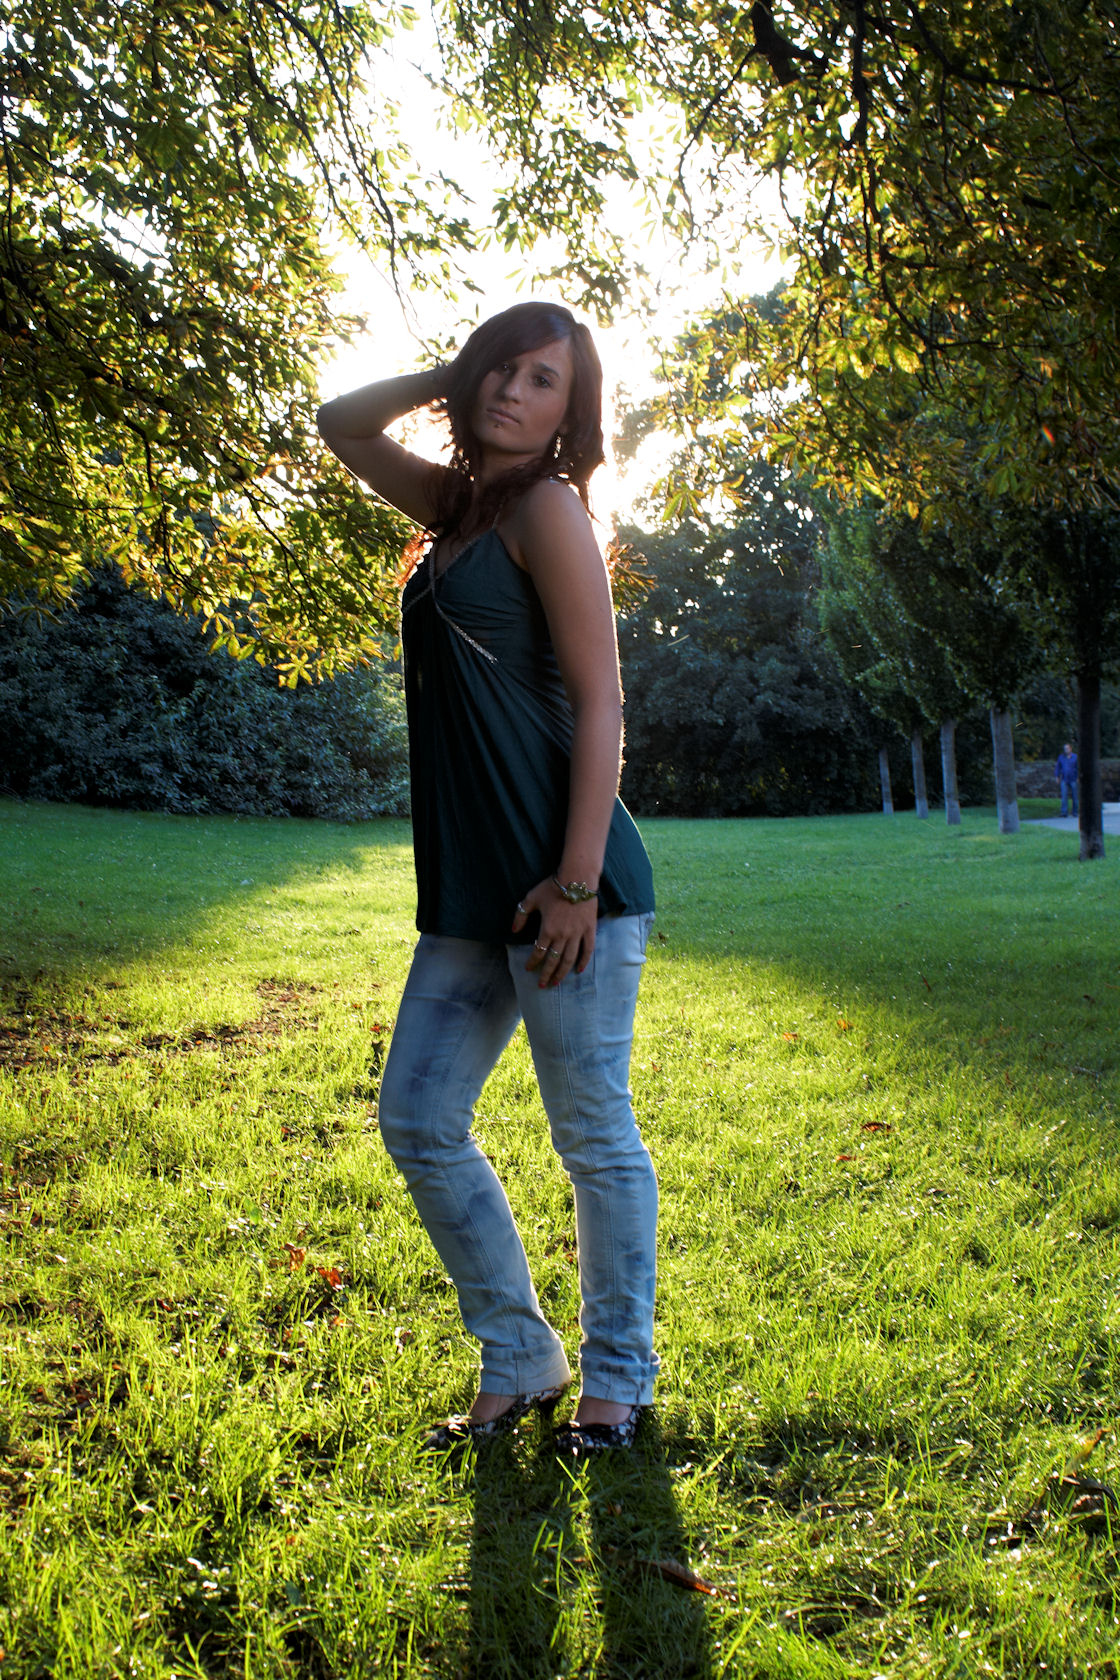 portrait_petravysehrad_3070